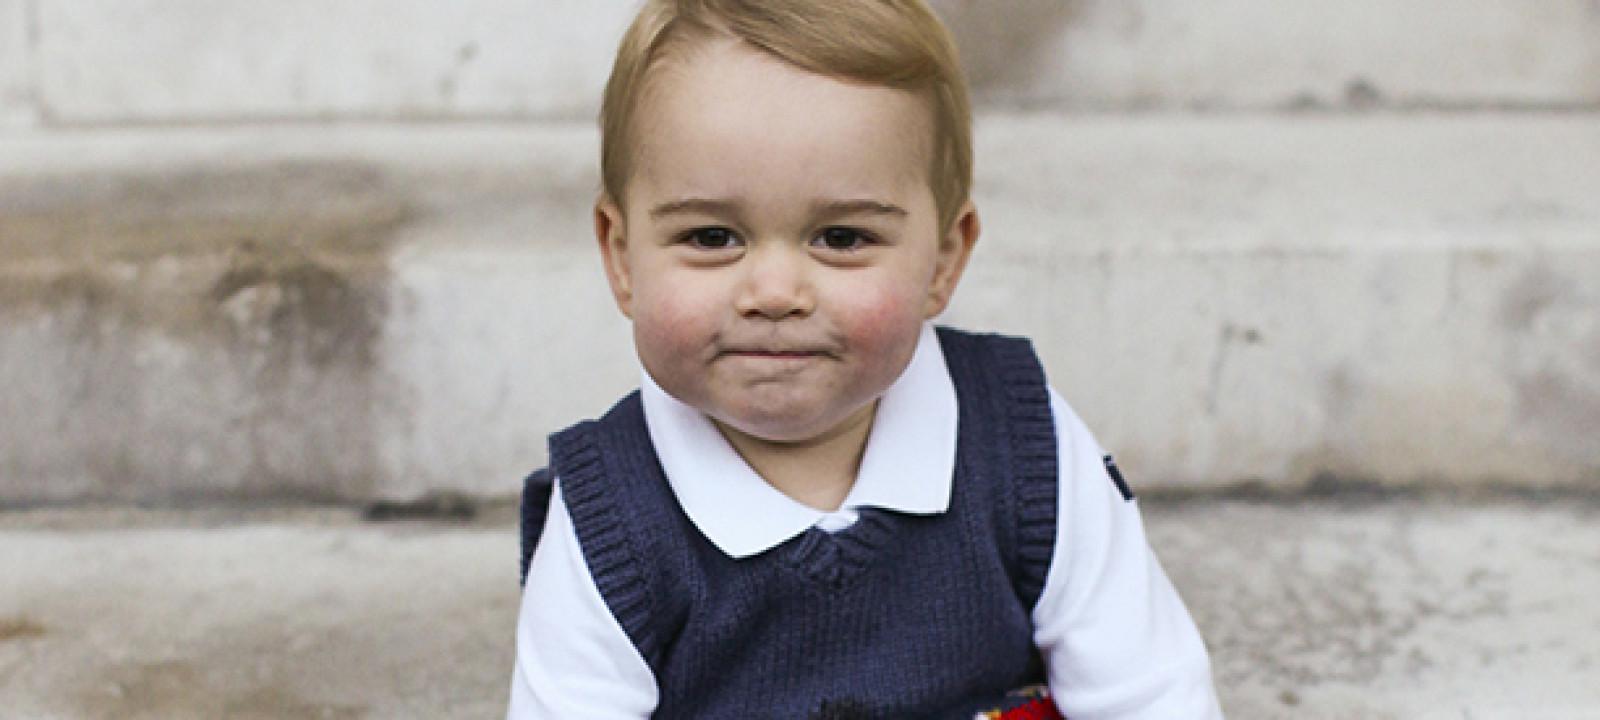 Christmas Photographs Of Prince George